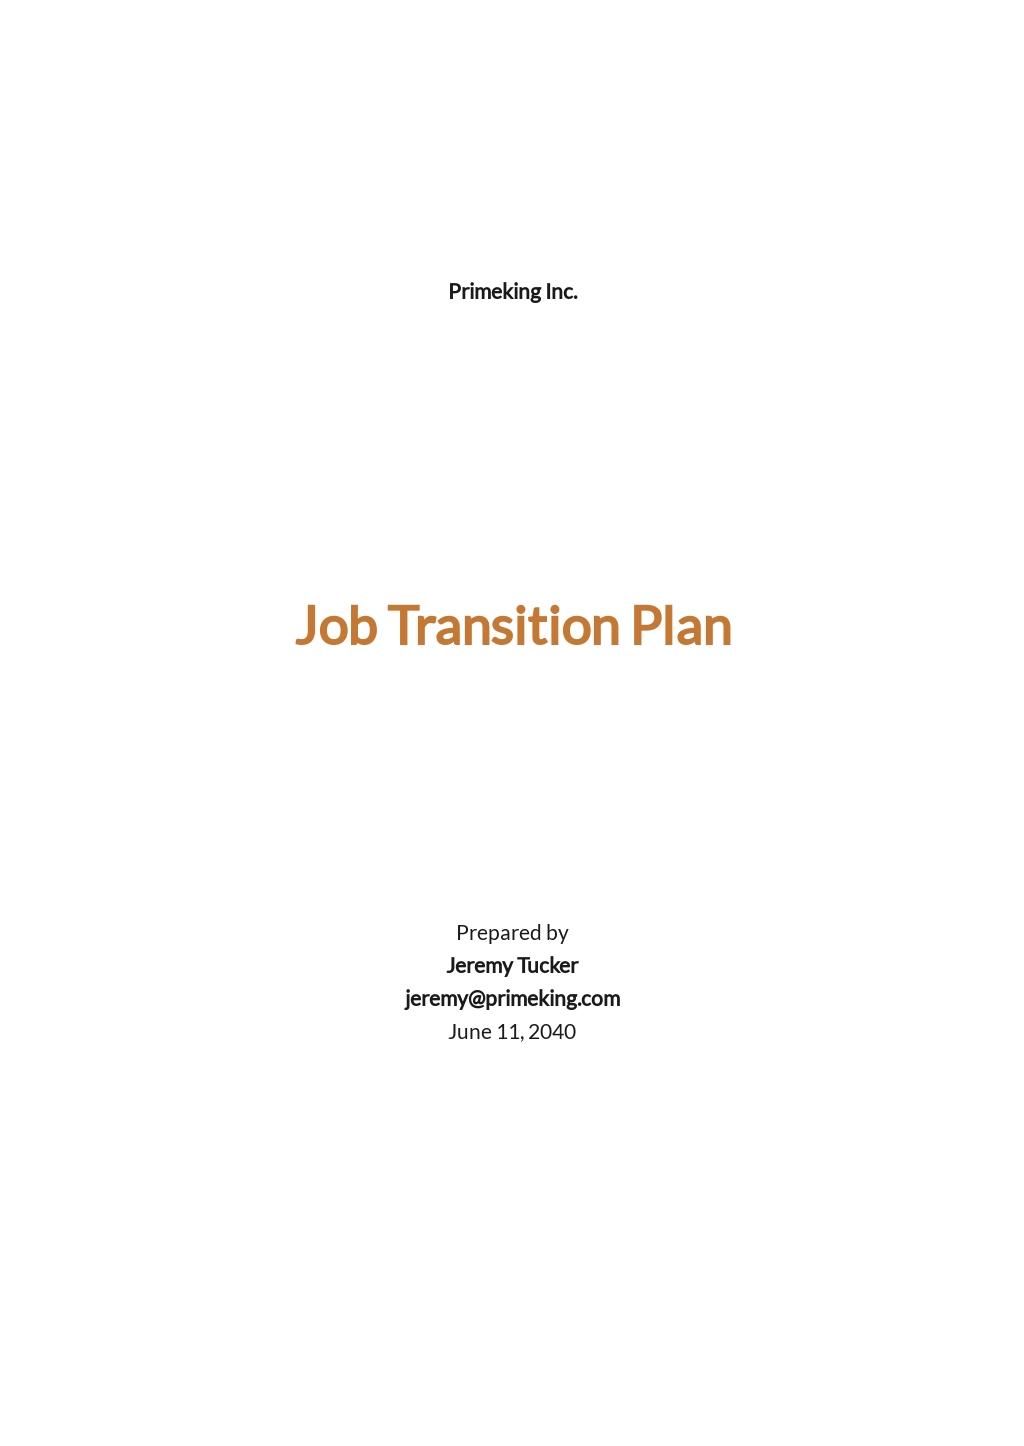 Job Transition Plan Template